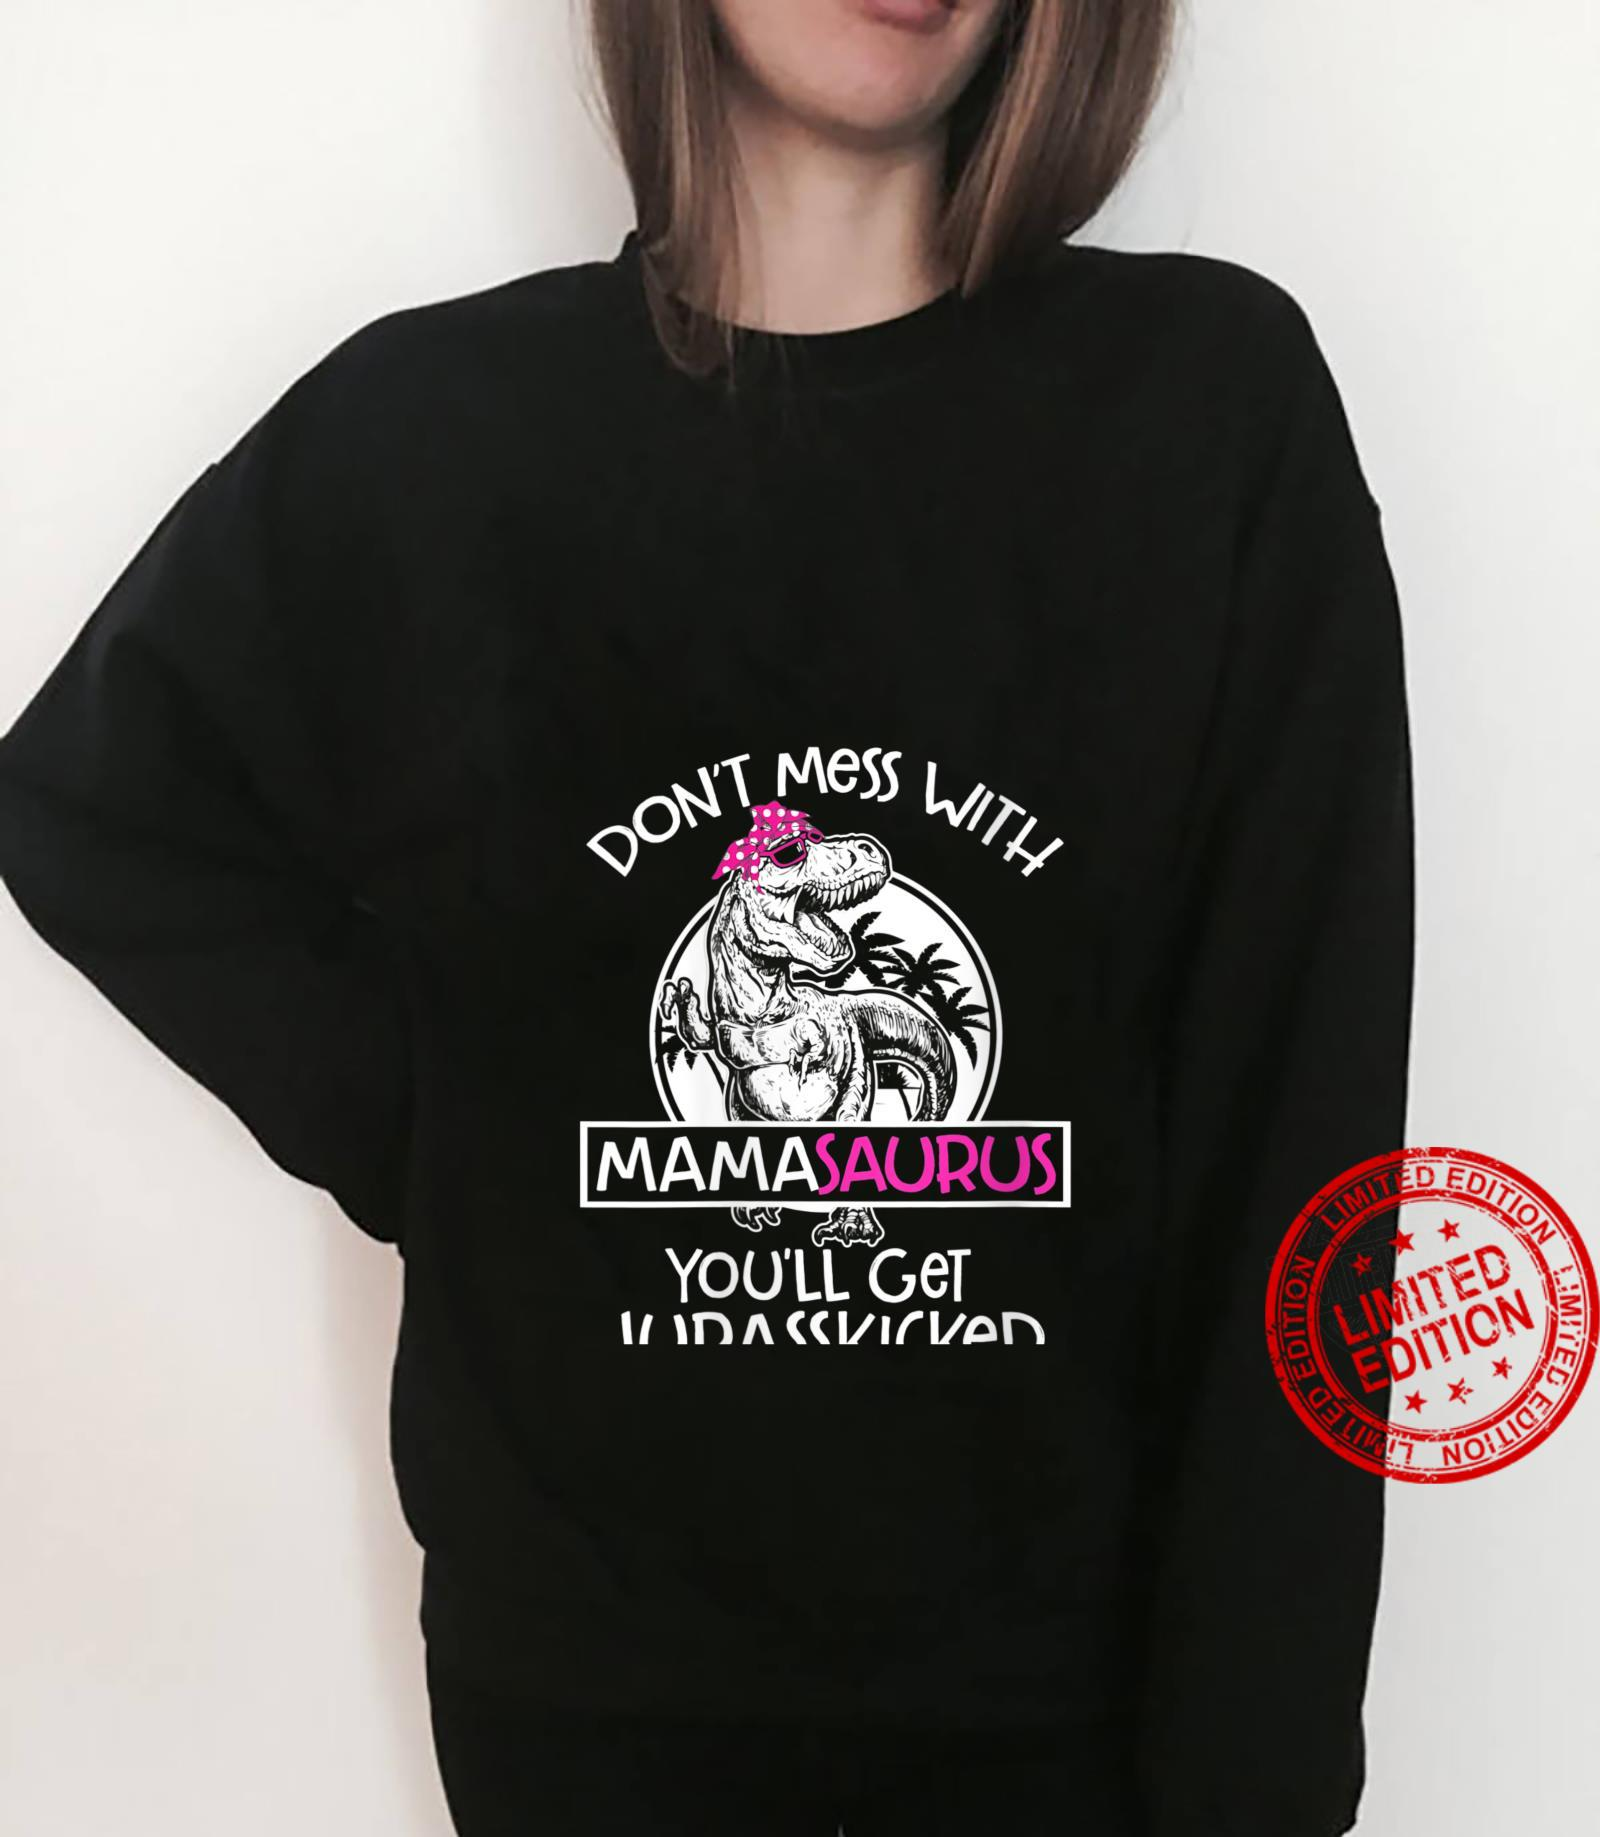 Womens Retro Don'tMessWith Mamasaurus You'll Get Jurasskicked Shirt sweater